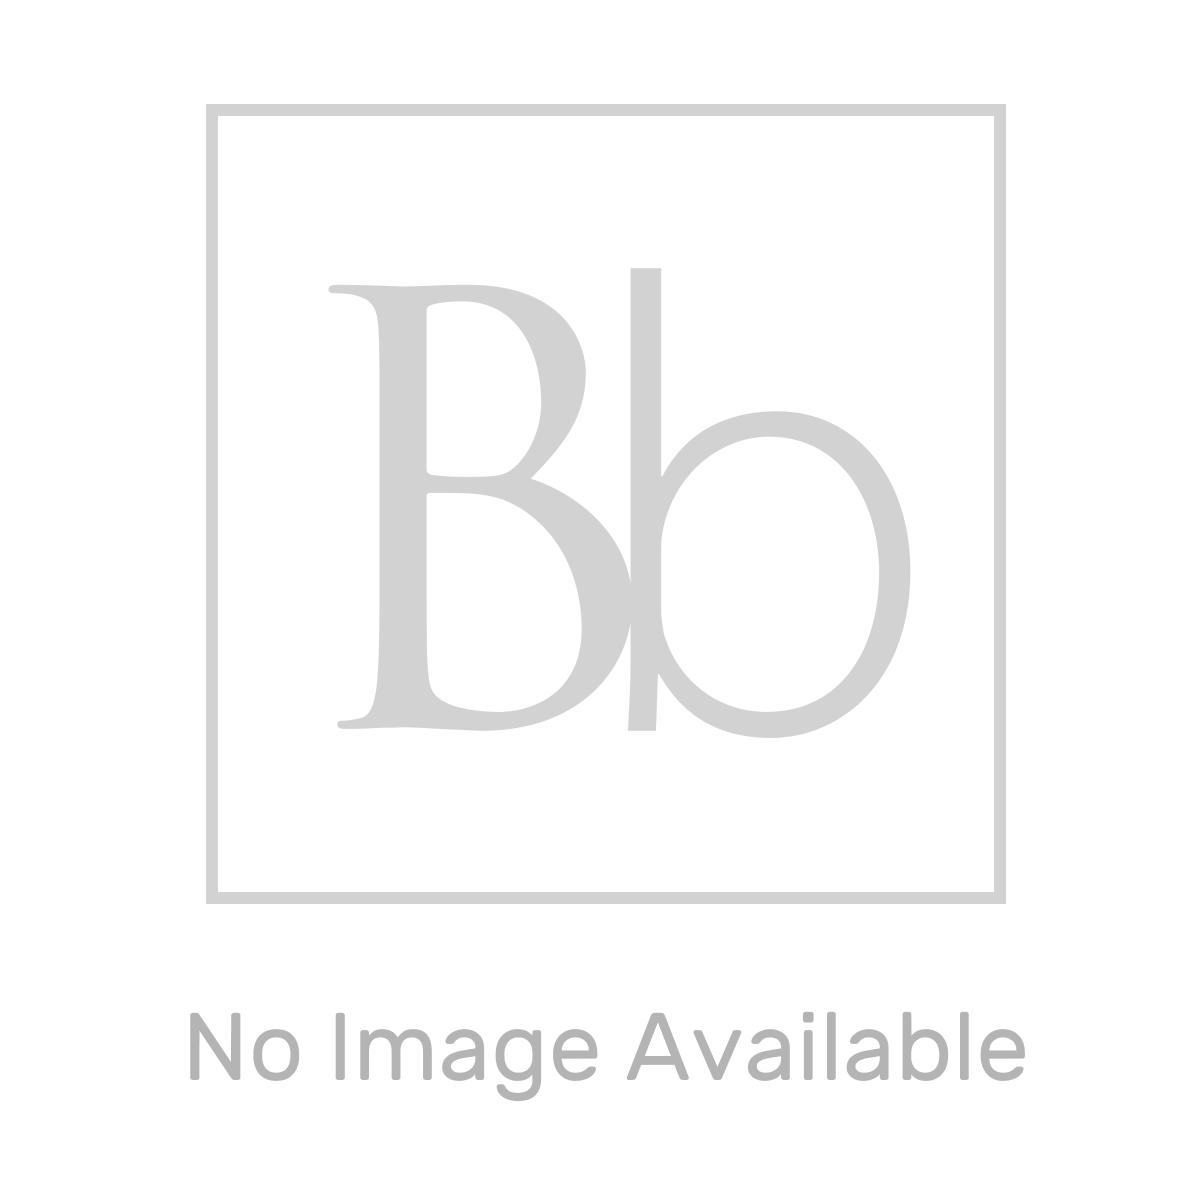 Aquadart White Slate Shower Tray 1400 x 800 Dimension